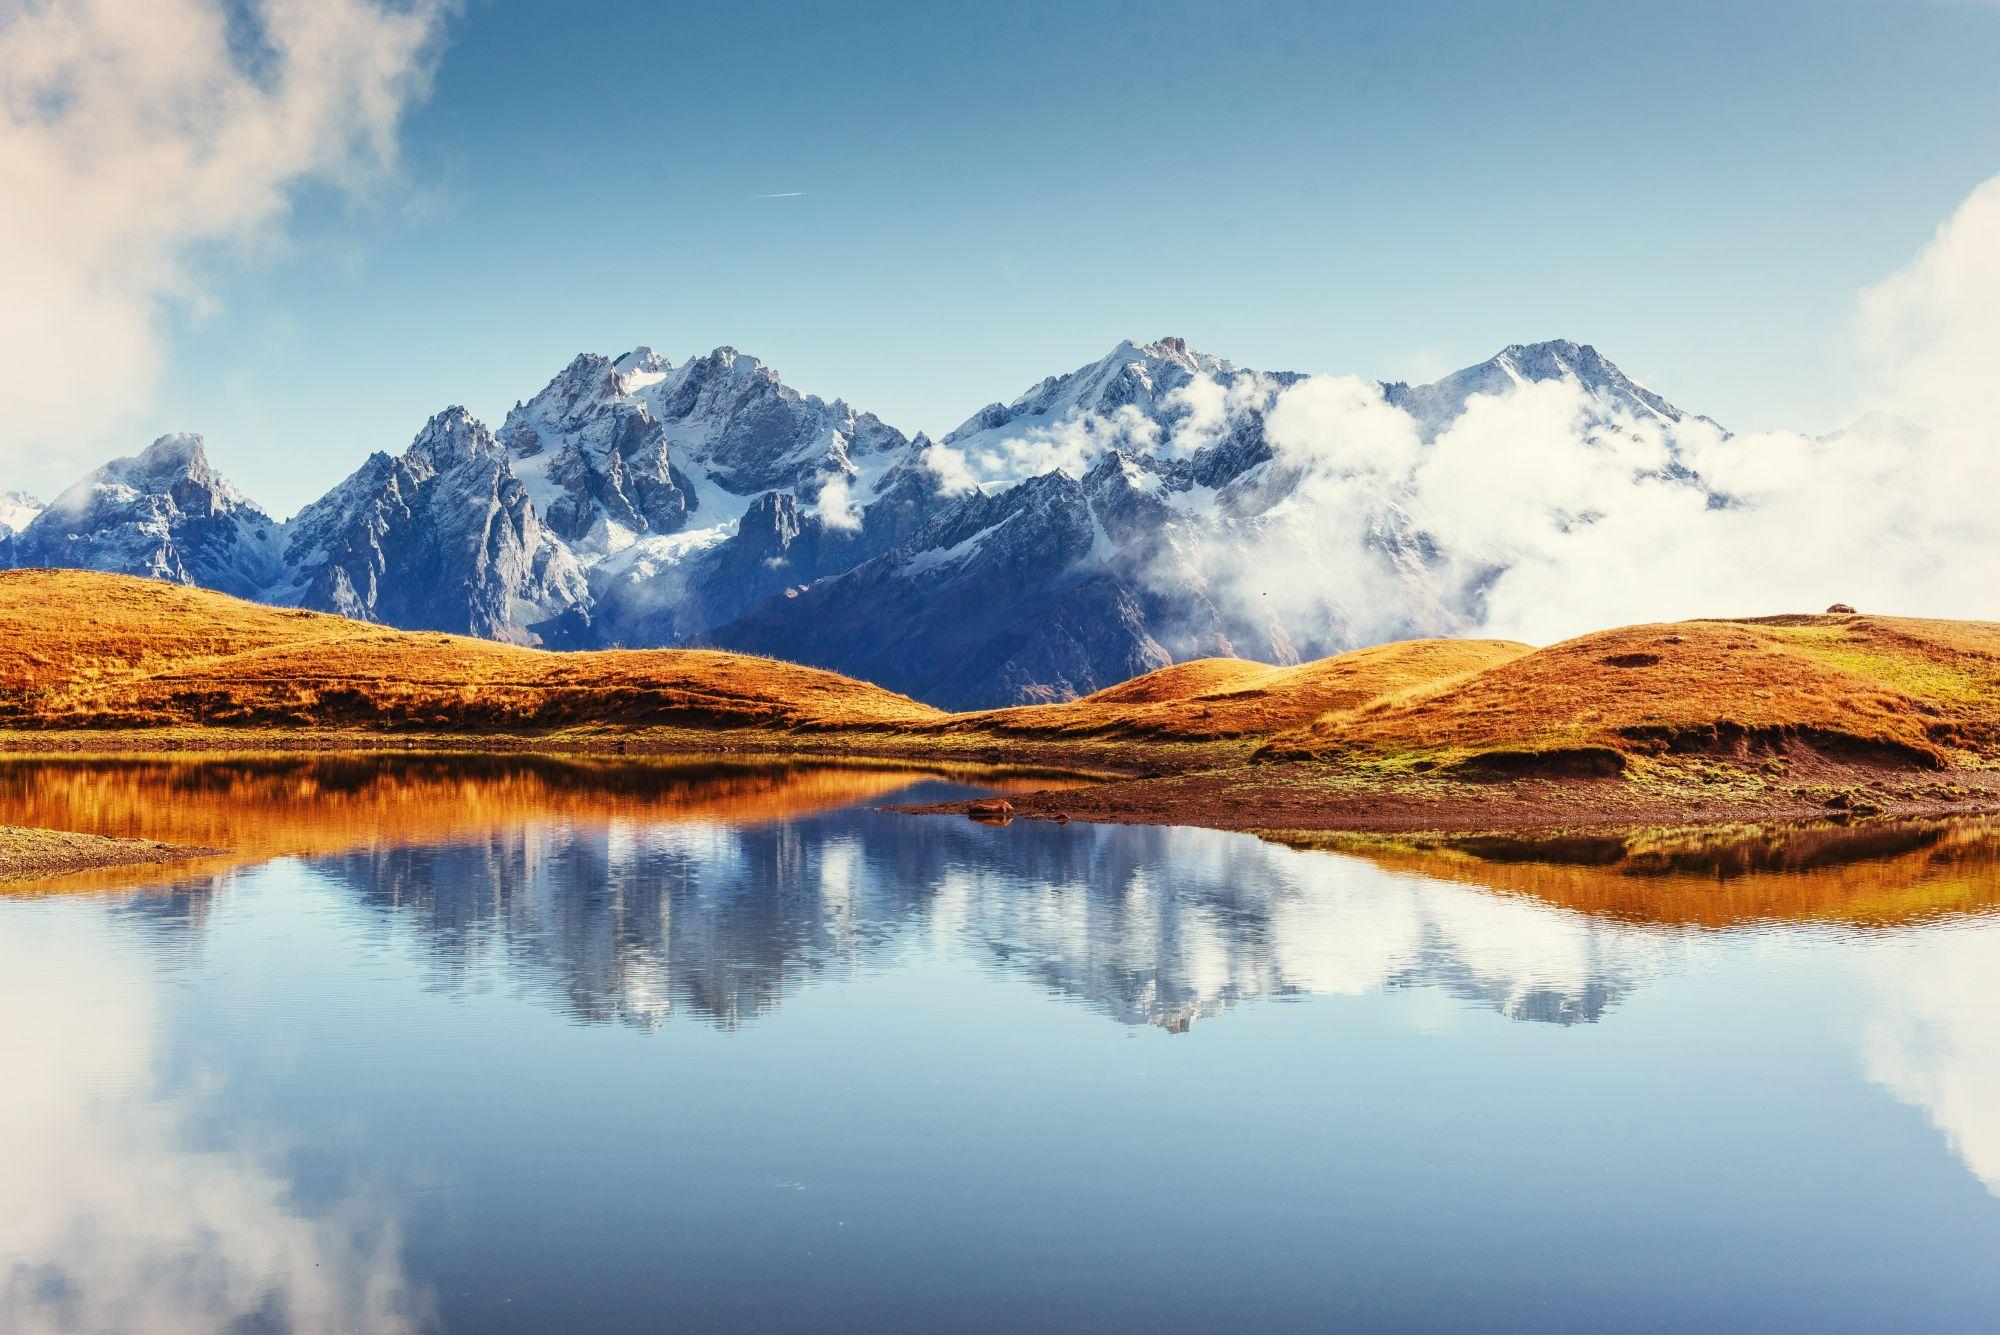 Gruzja widok na góry